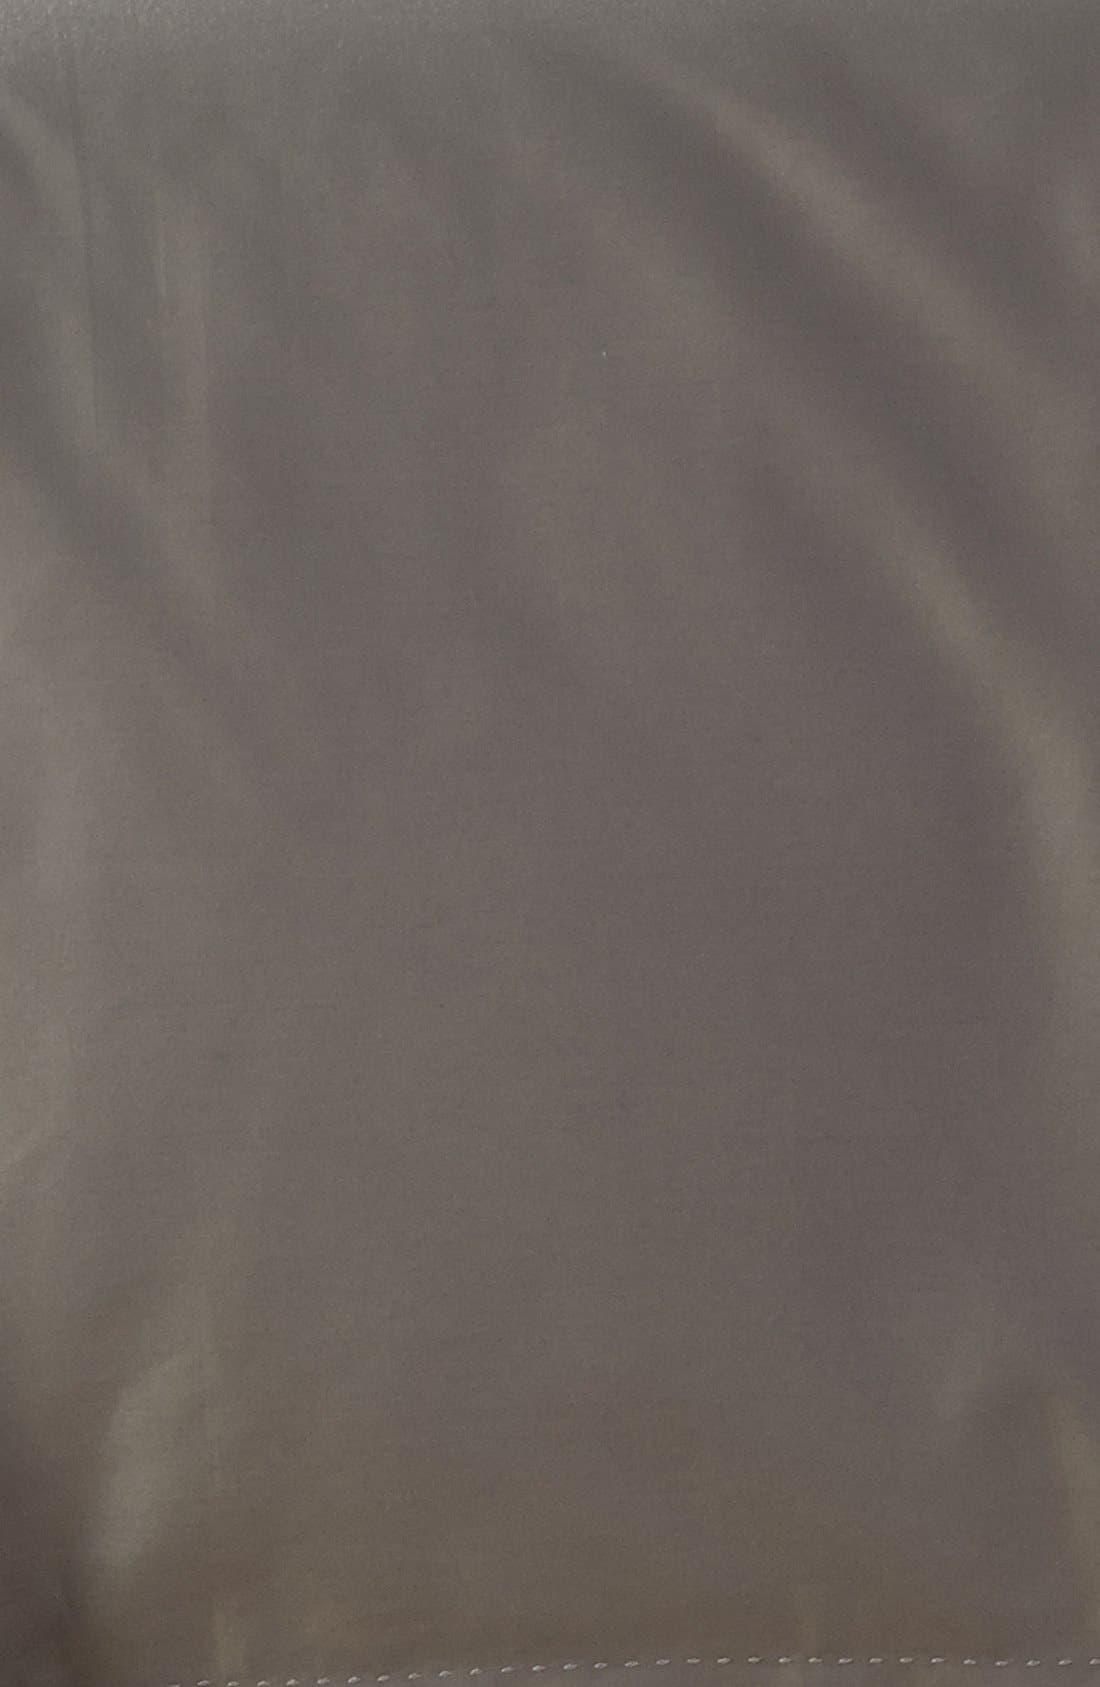 Alternate Image 2  - Nordstrom at Home 'Dorin' 400 Thread Count Cotton Sateen Duvet Cover